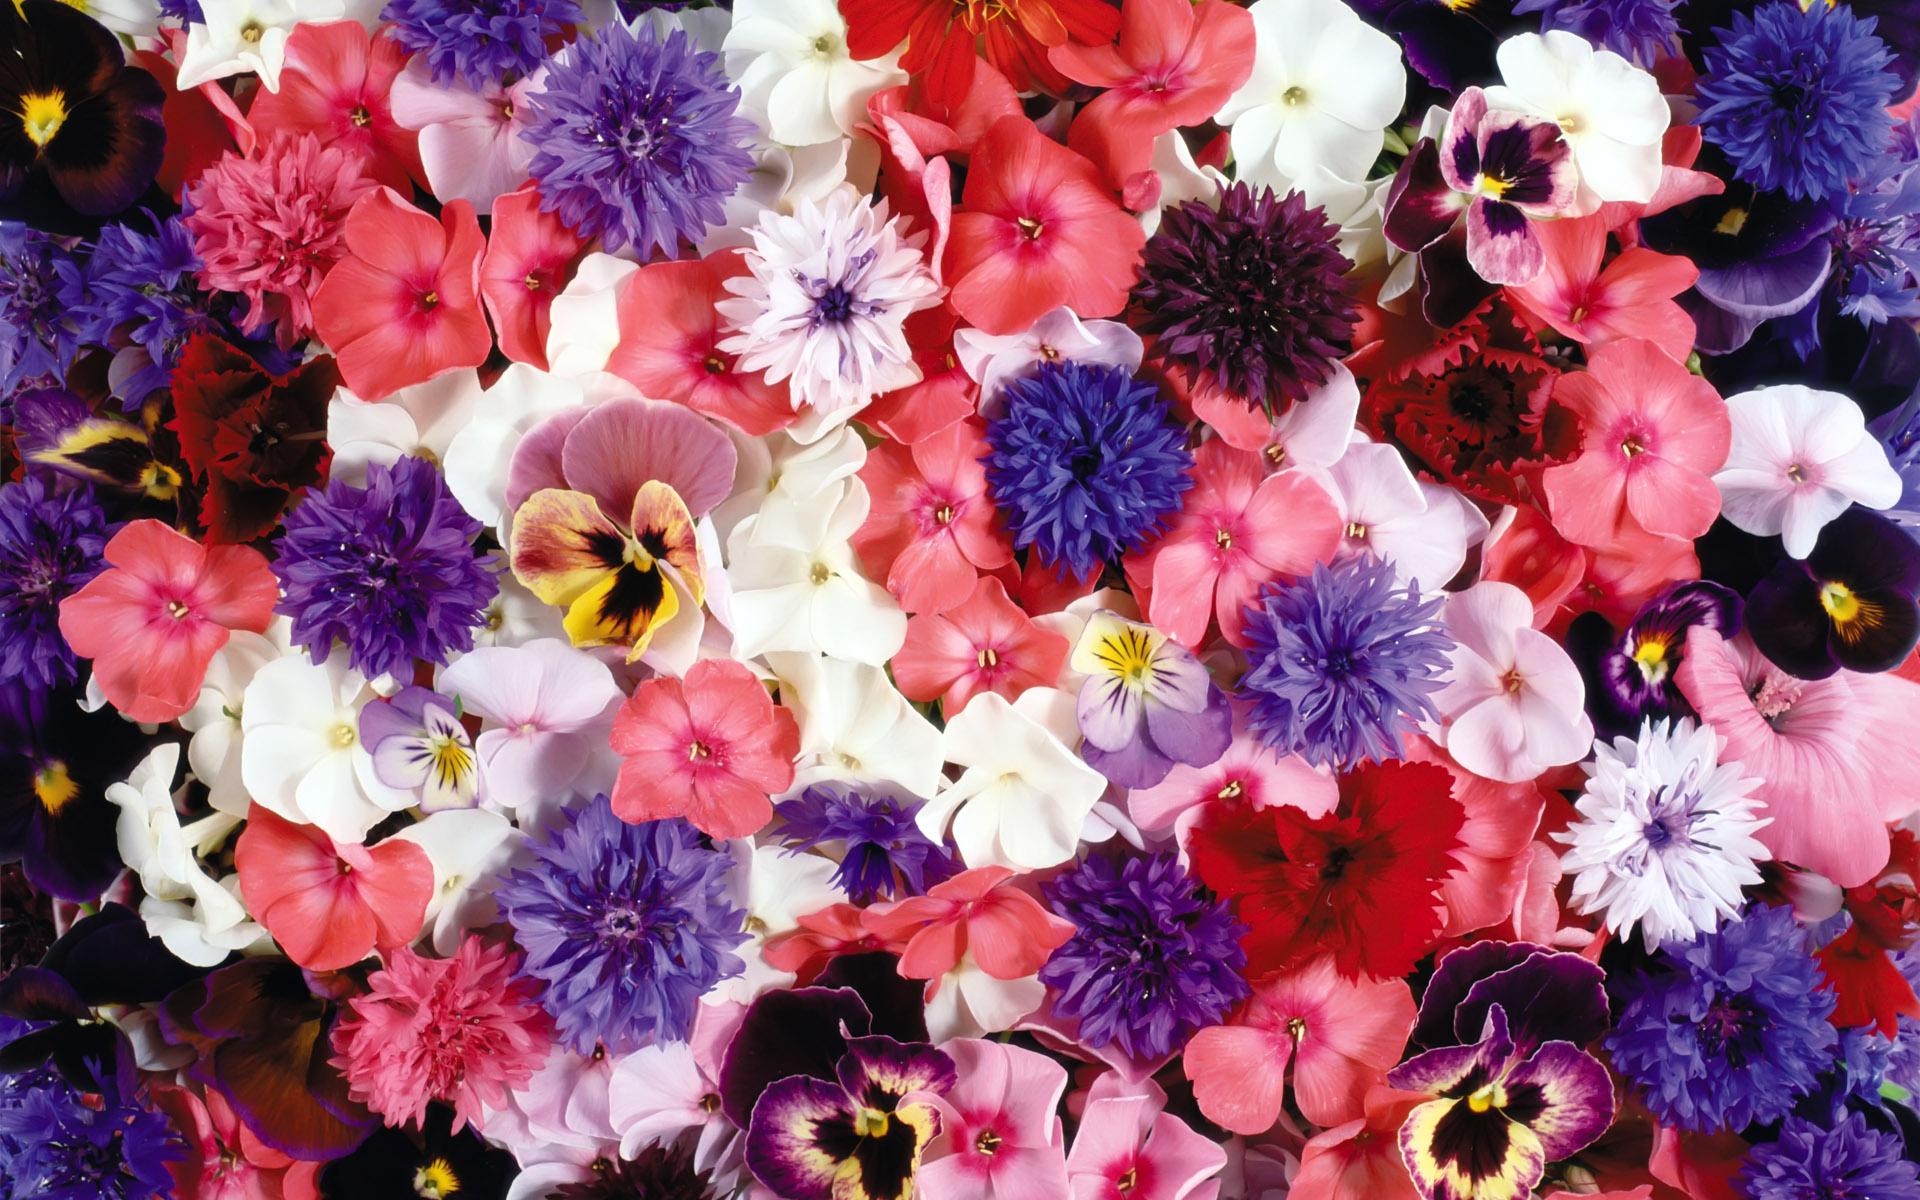 Flores Horizontales Dibujos Animados Patrón De Fondo: Flower Full HD Wallpaper And Background